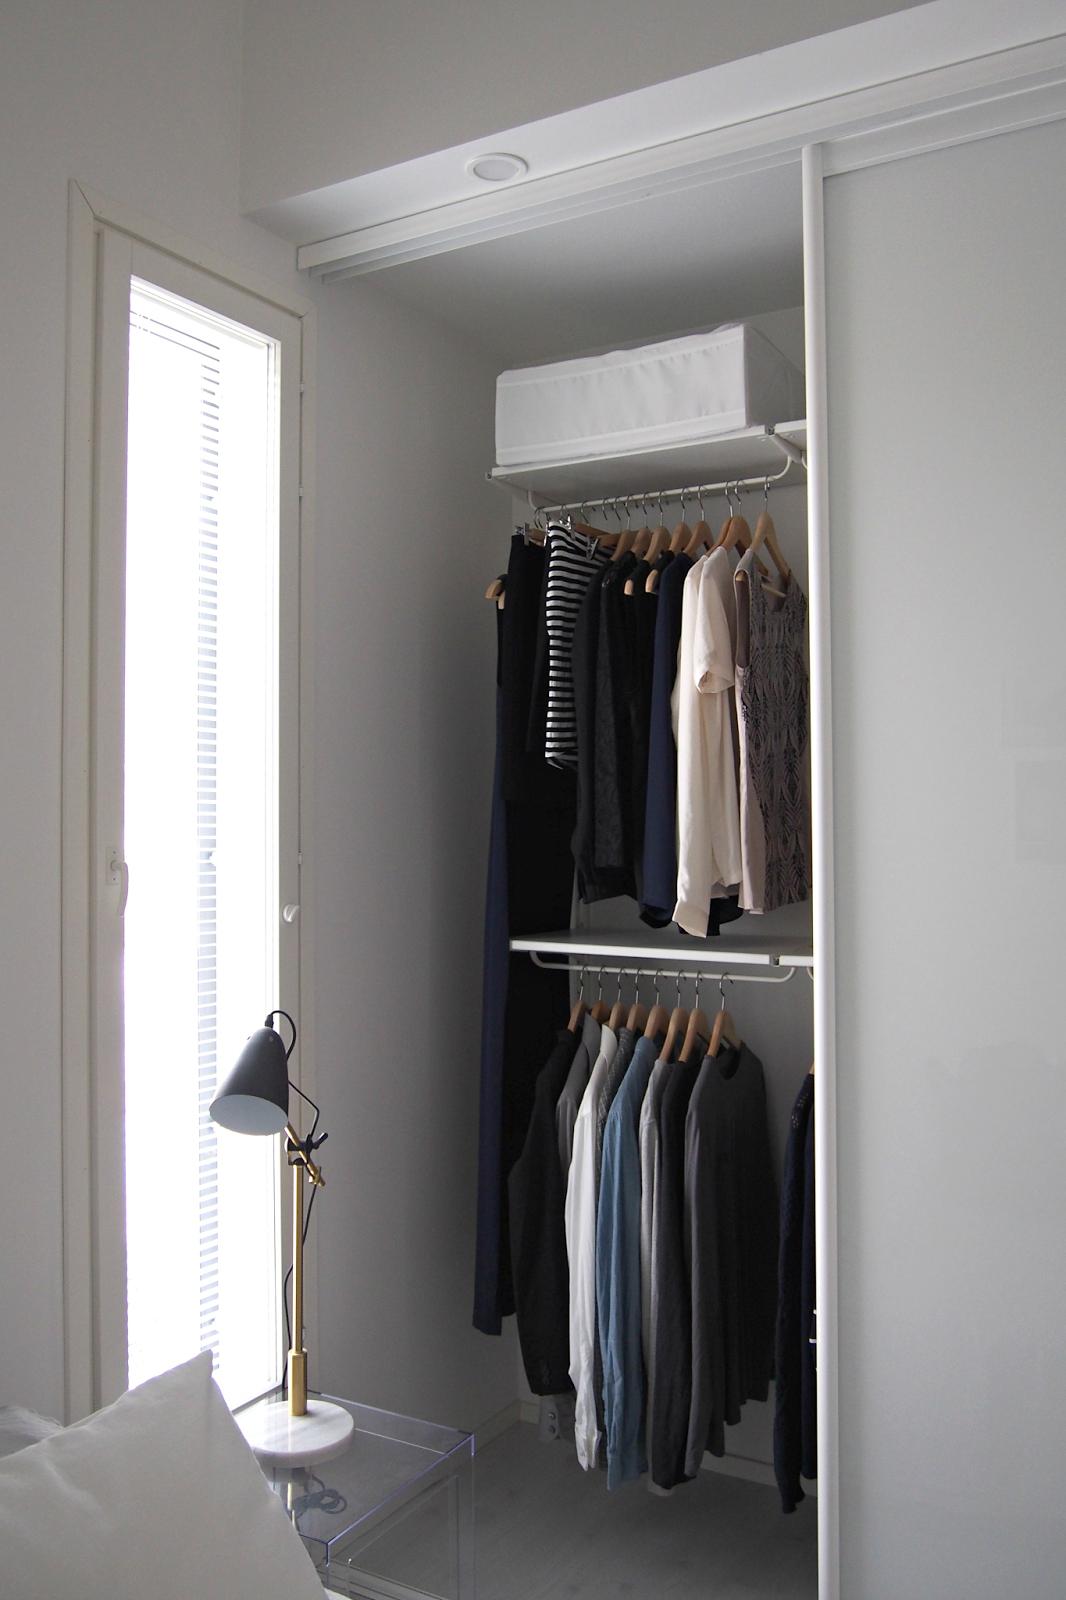 Hannas home clothing closet bedroom interior pinterest